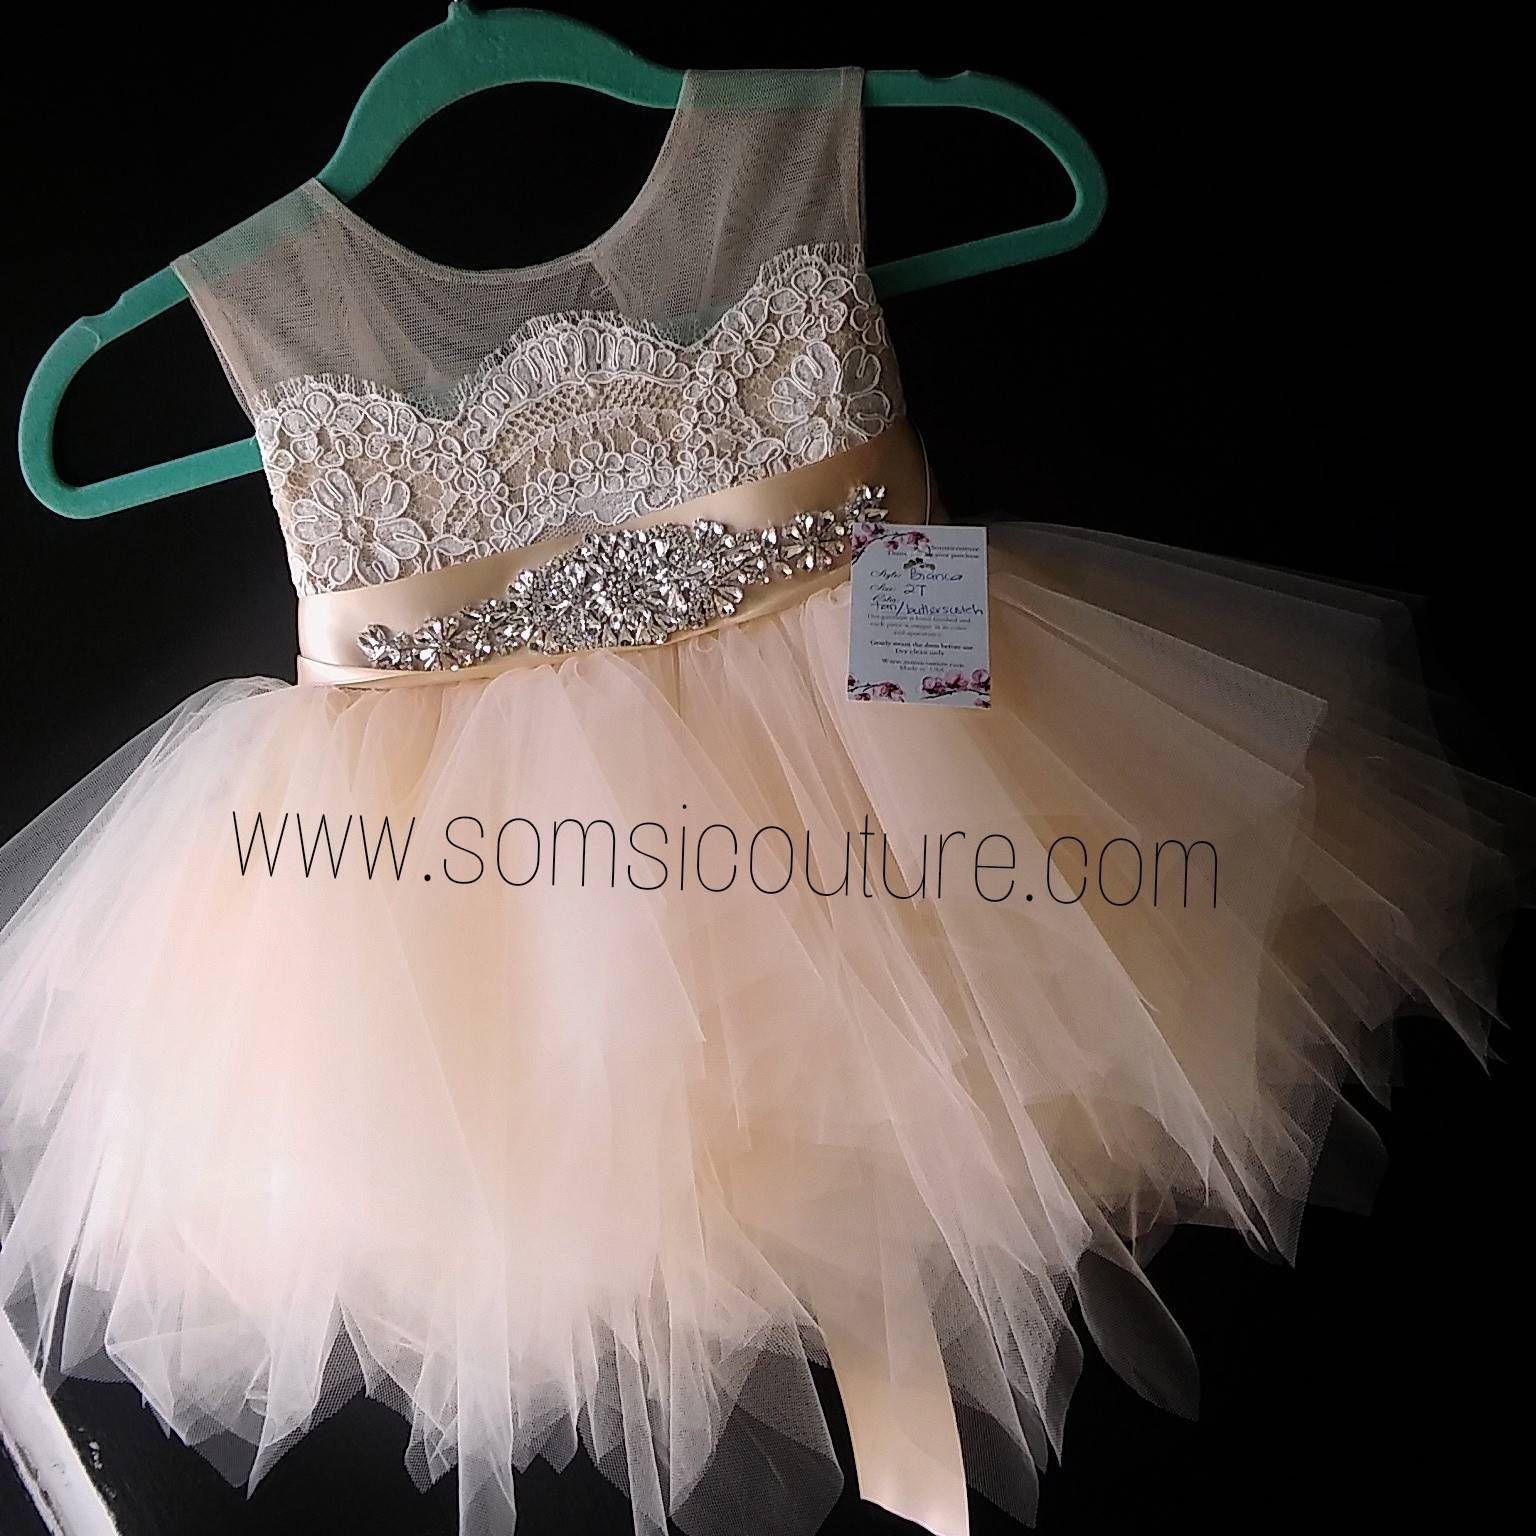 6f884d7ae flower girl dress 'Bianca' with rhinestone sash, tan sheer netting ...